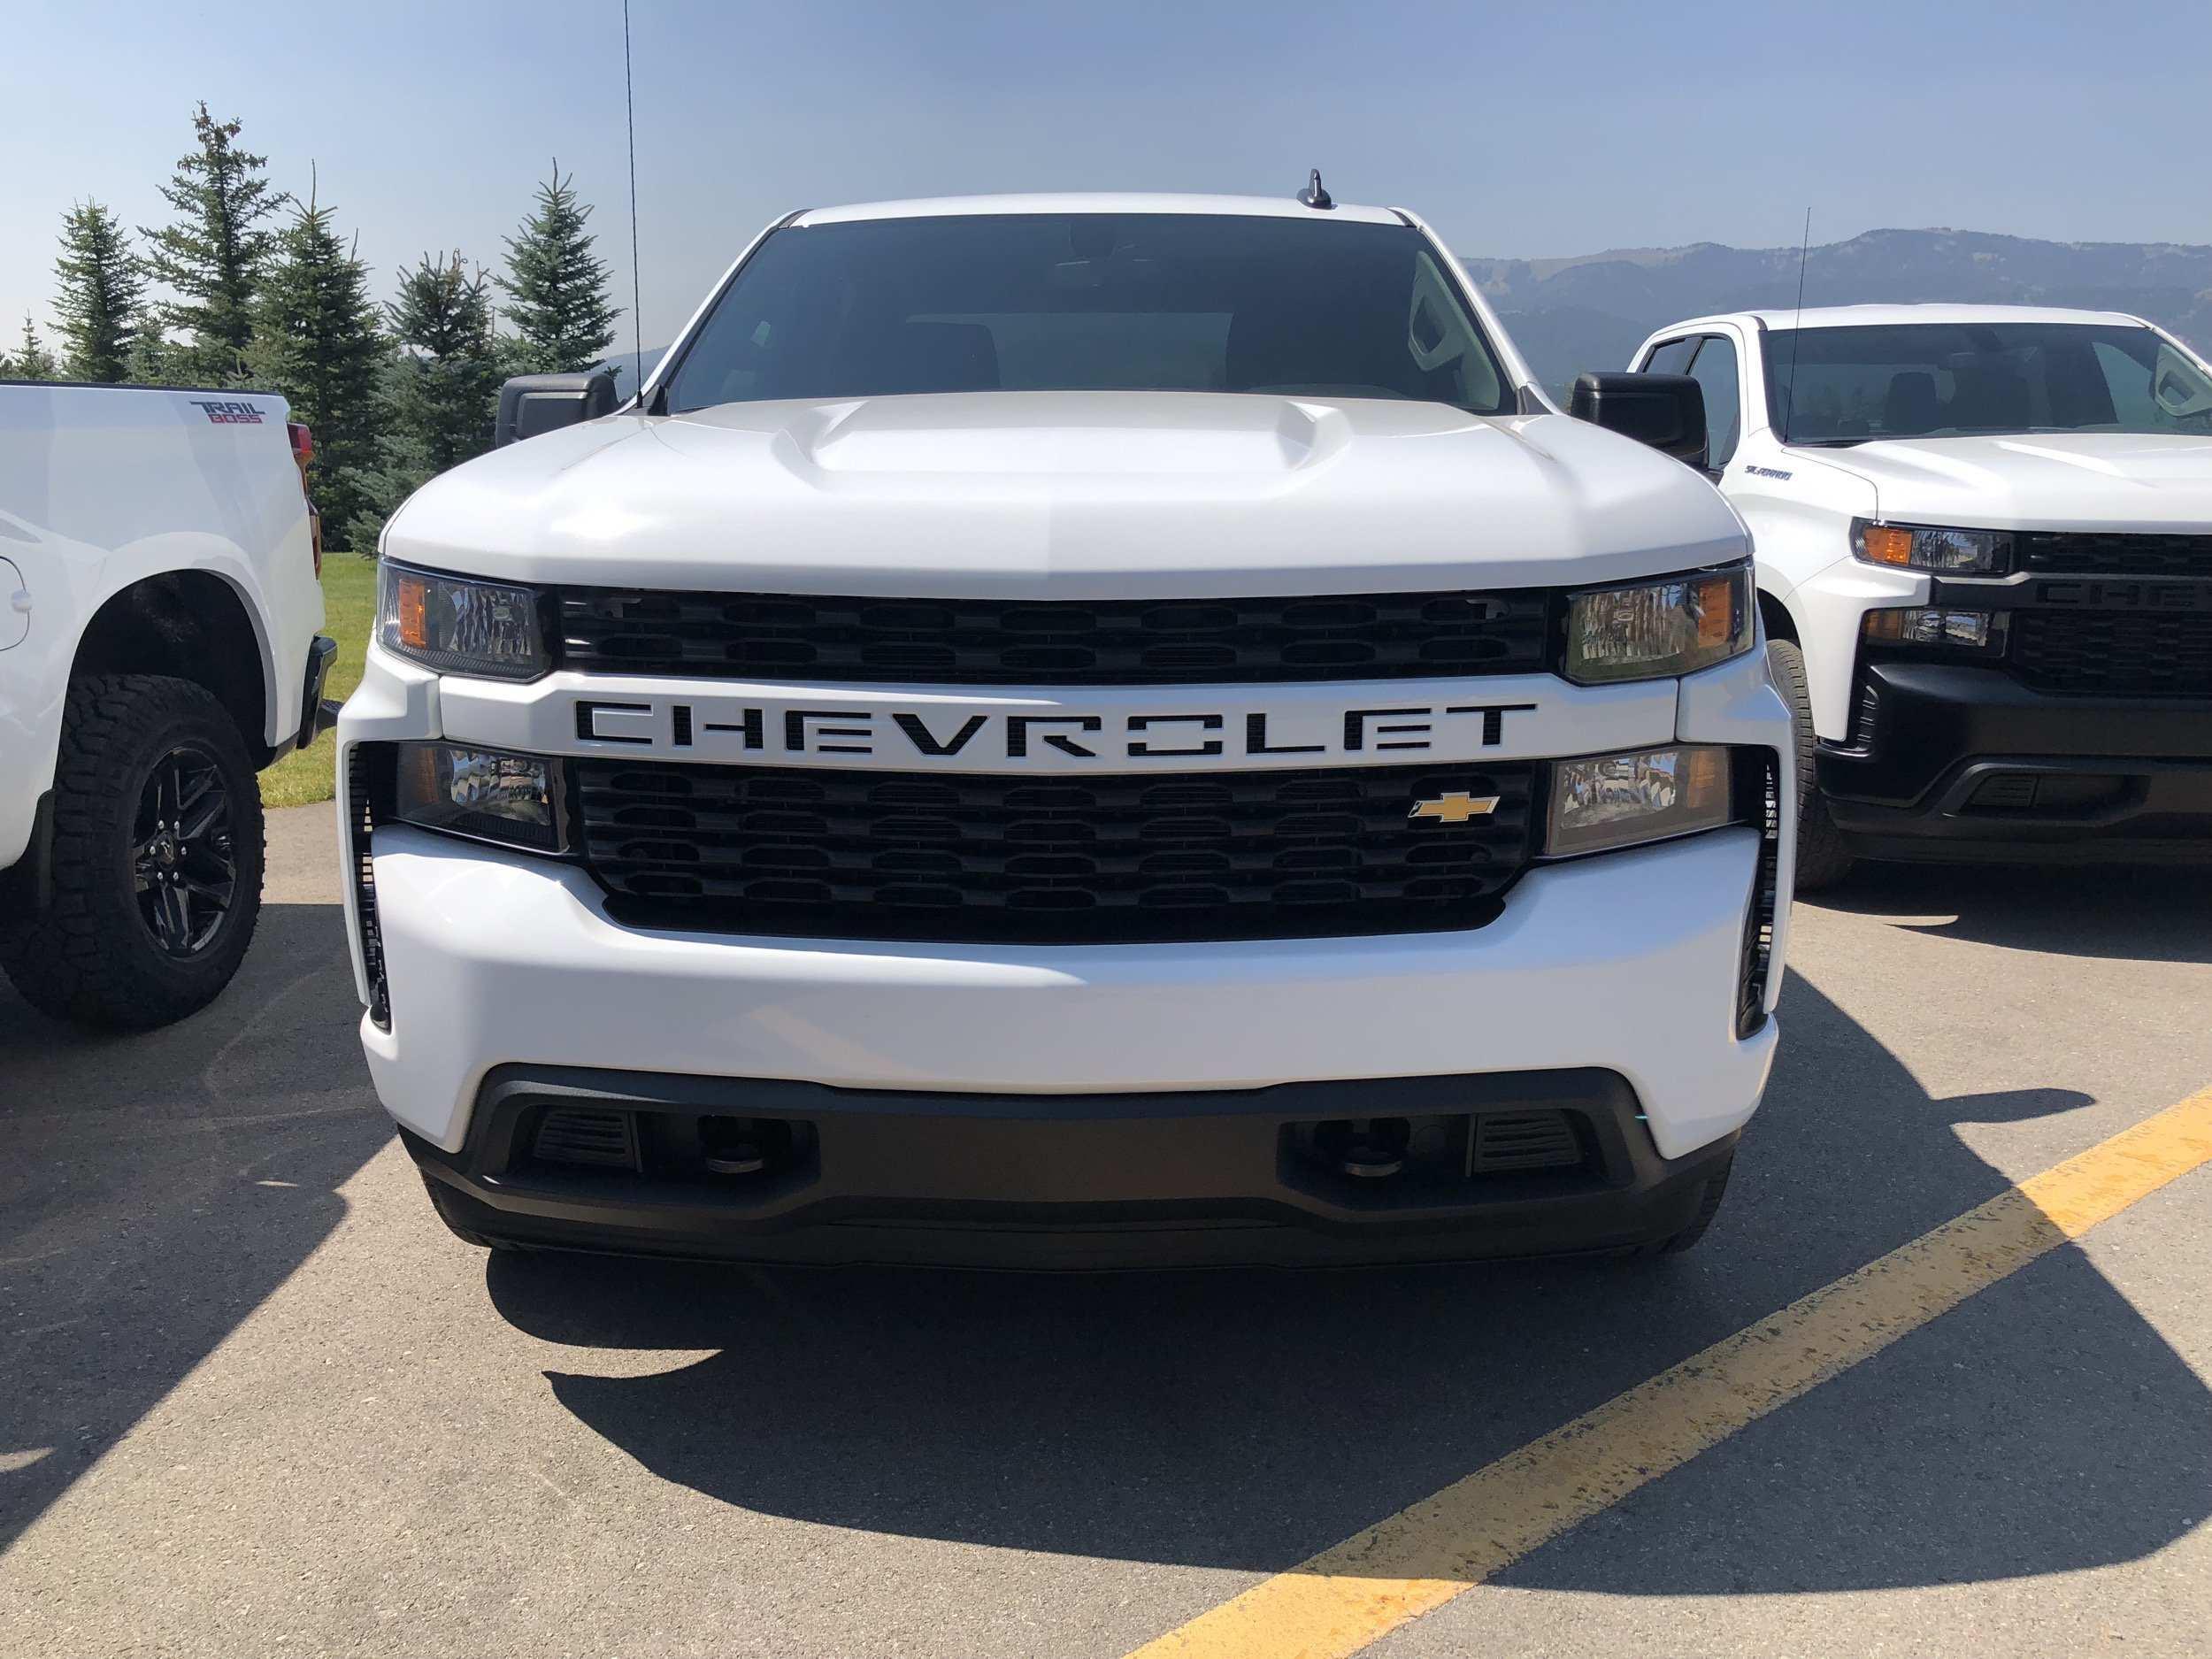 35 All New 2020 Chevrolet Silverado 1500 Ld Exterior by 2020 Chevrolet Silverado 1500 Ld